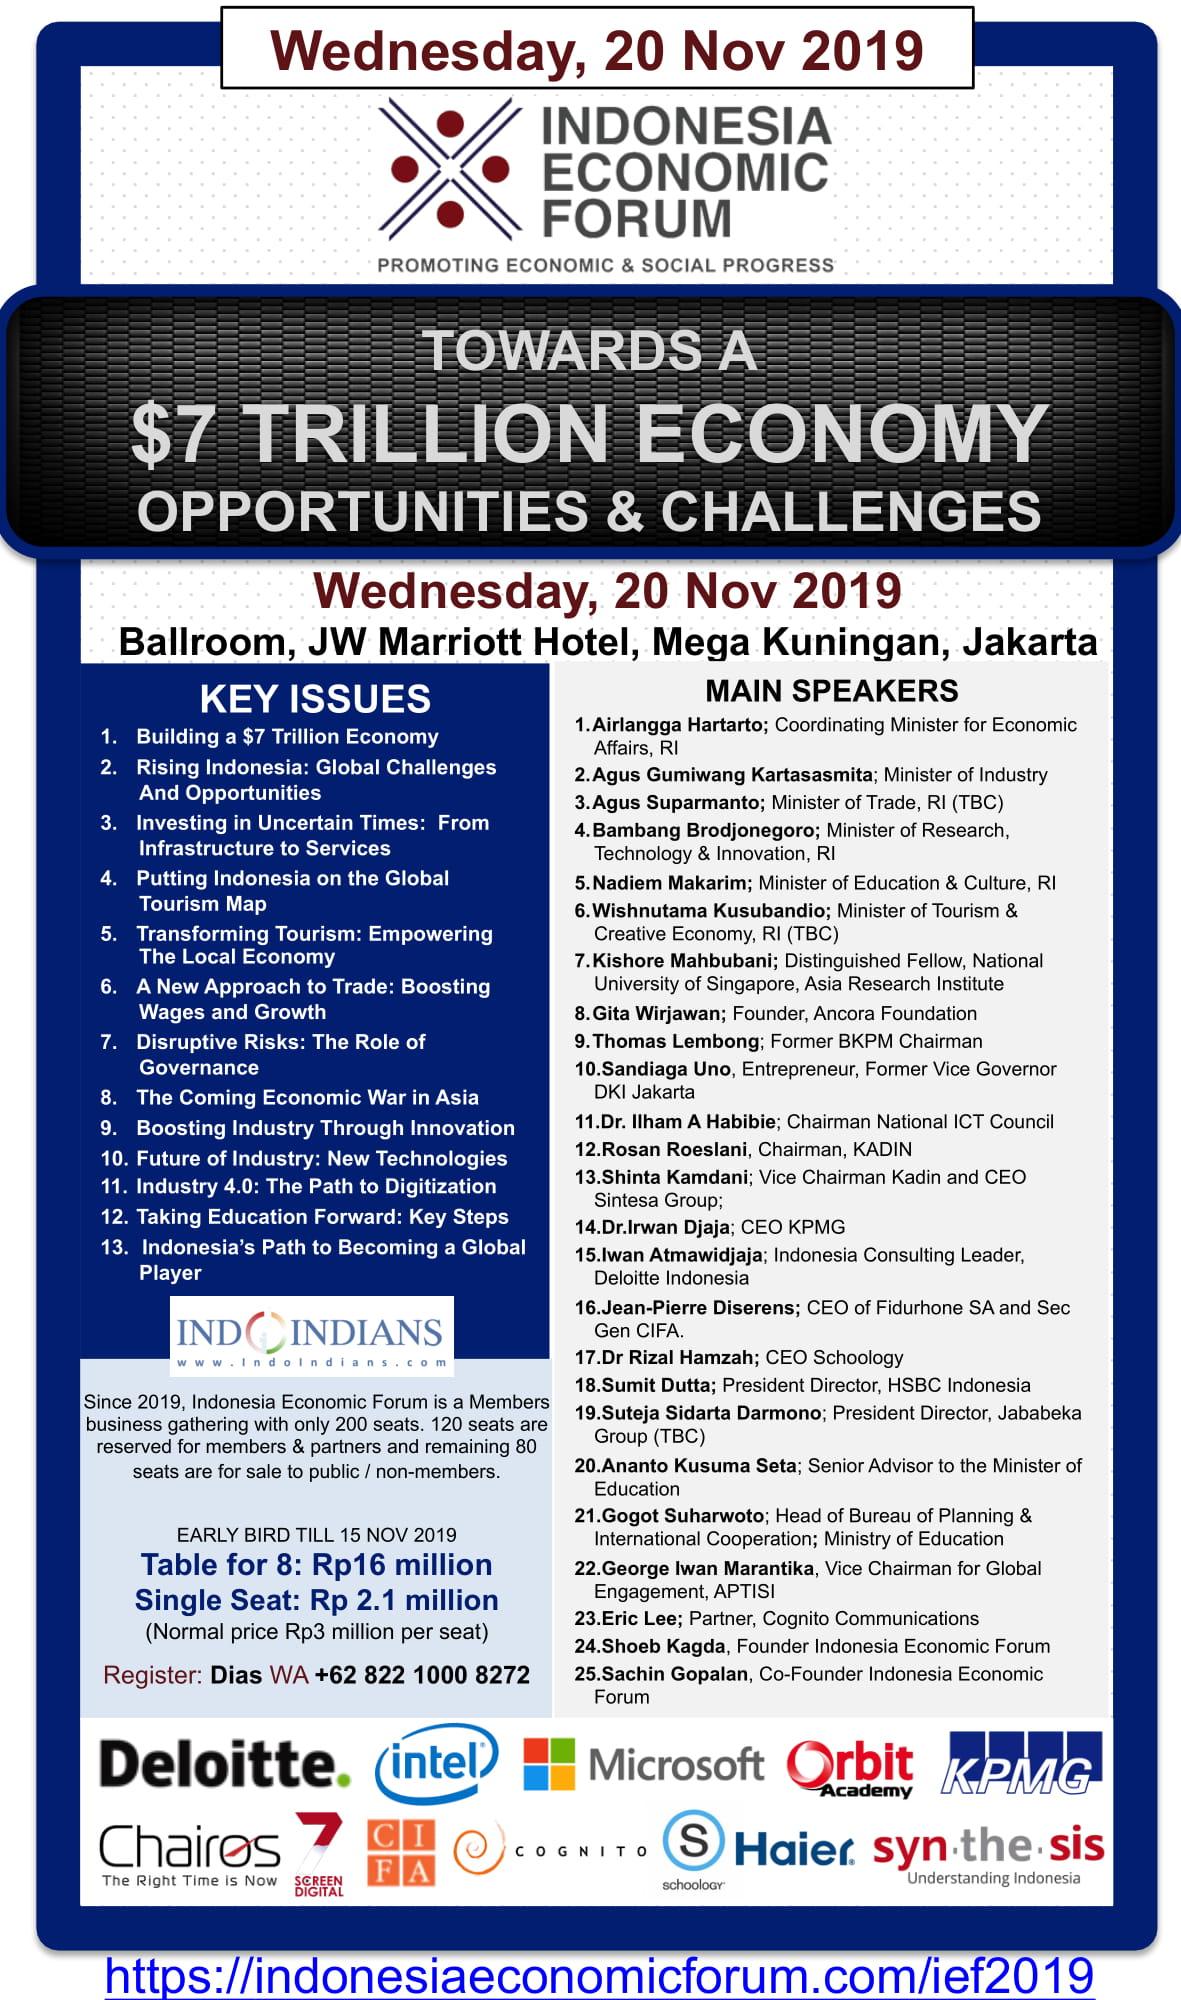 Indonesia Economic Forum 2019 – Towards A $7 Trillion Economy: Opportunities & Challenges